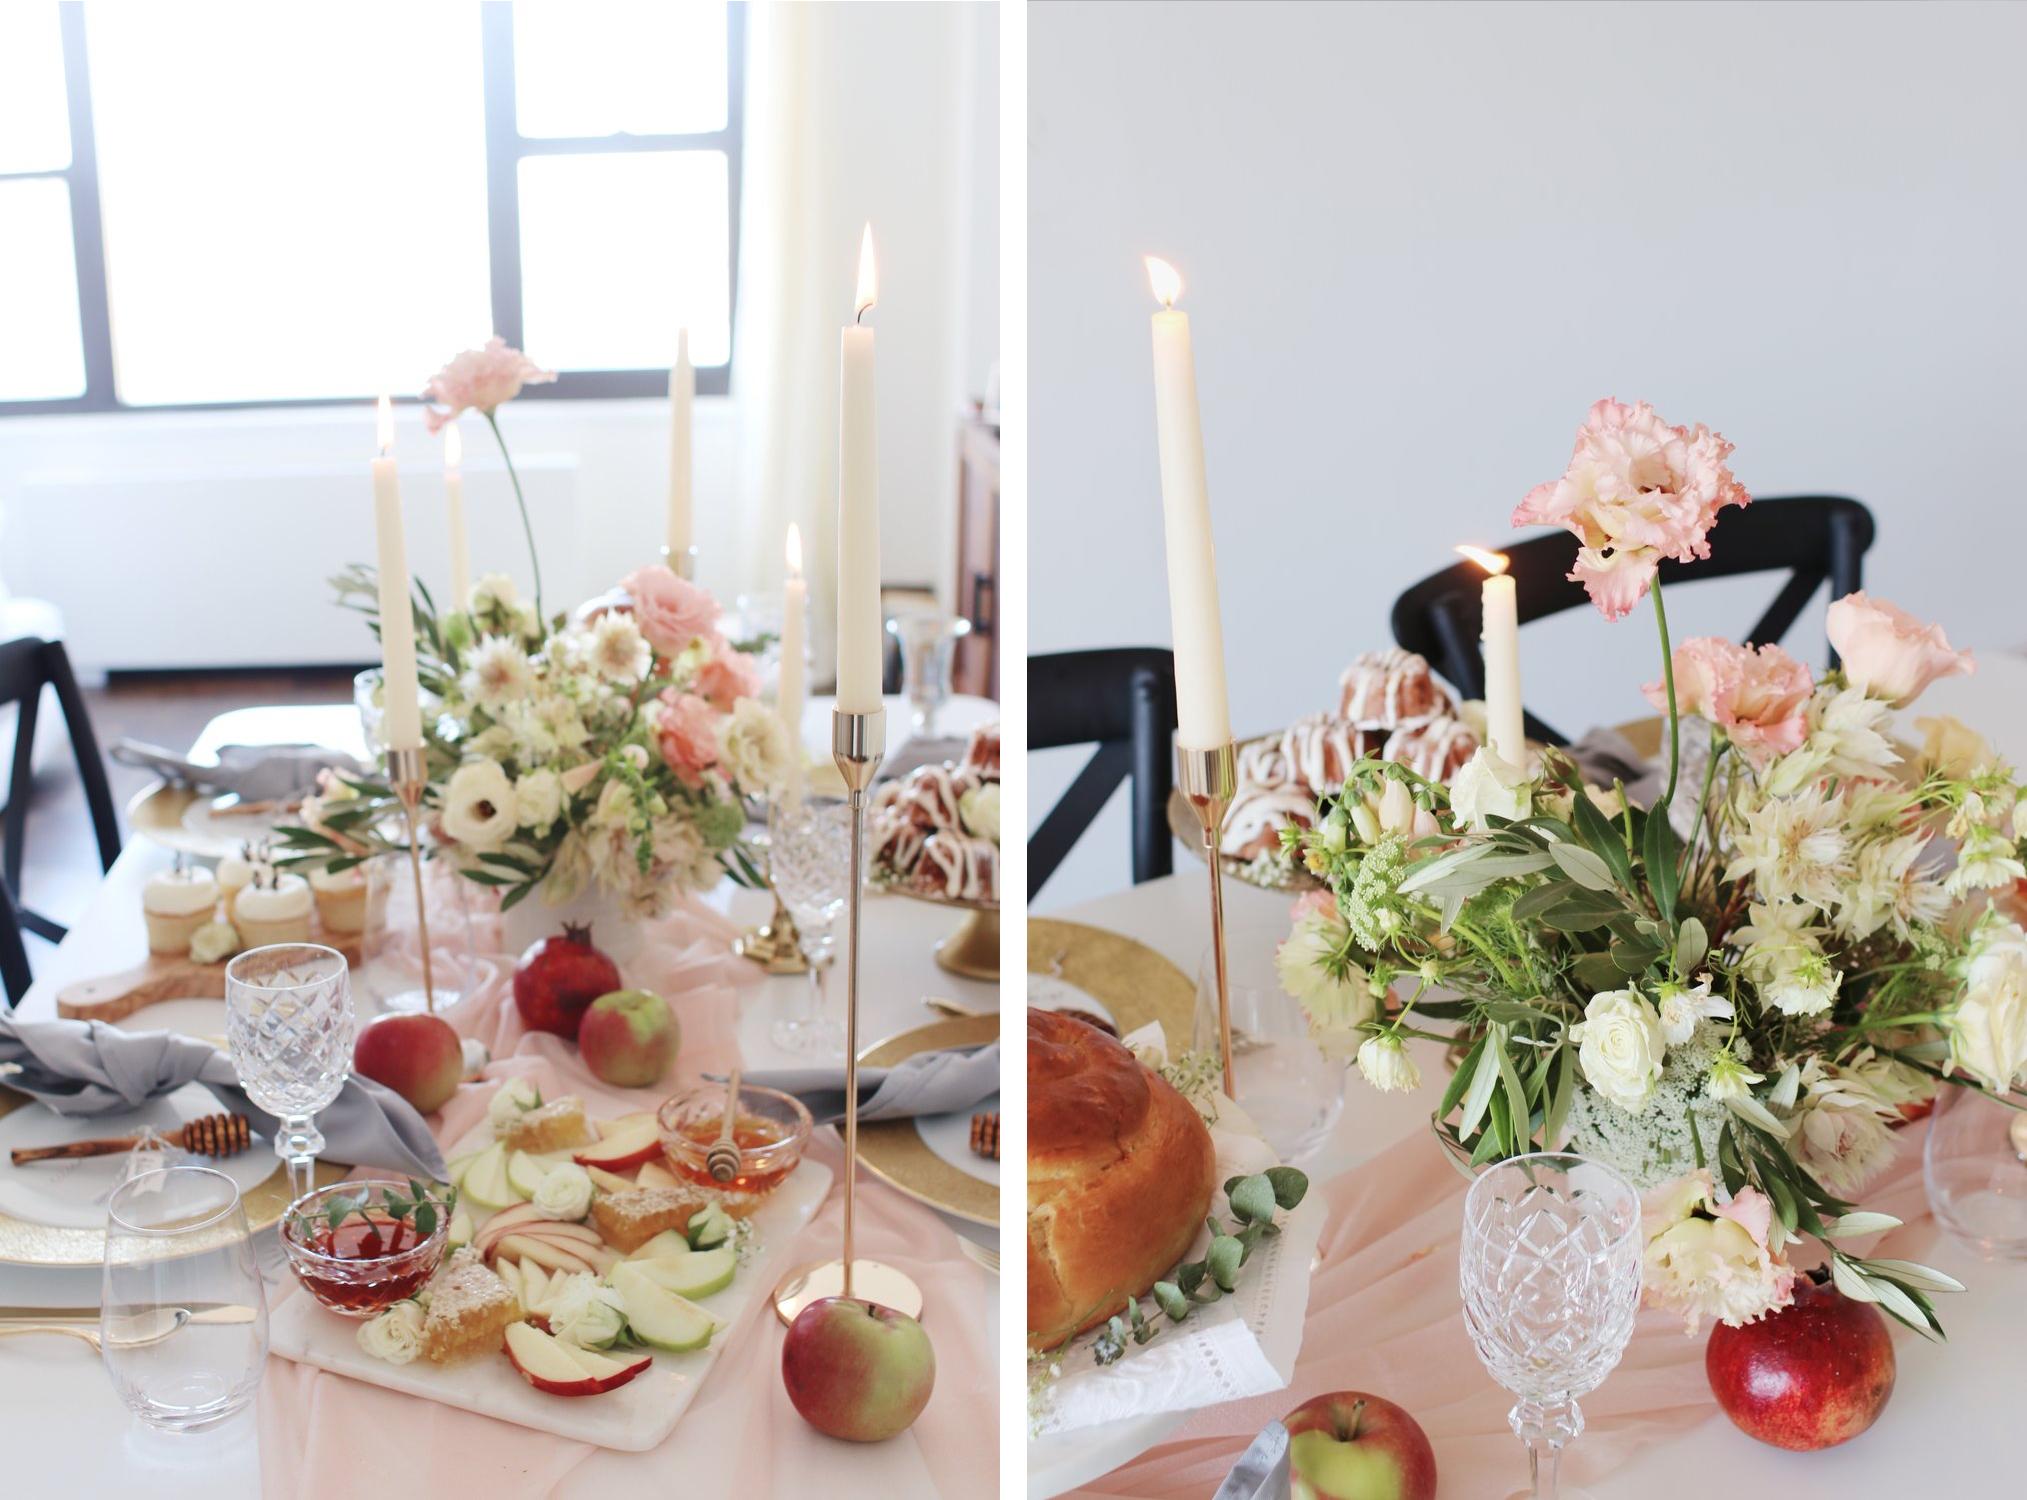 rosh-hashanah-table-setting-ideas-flowers.jpg